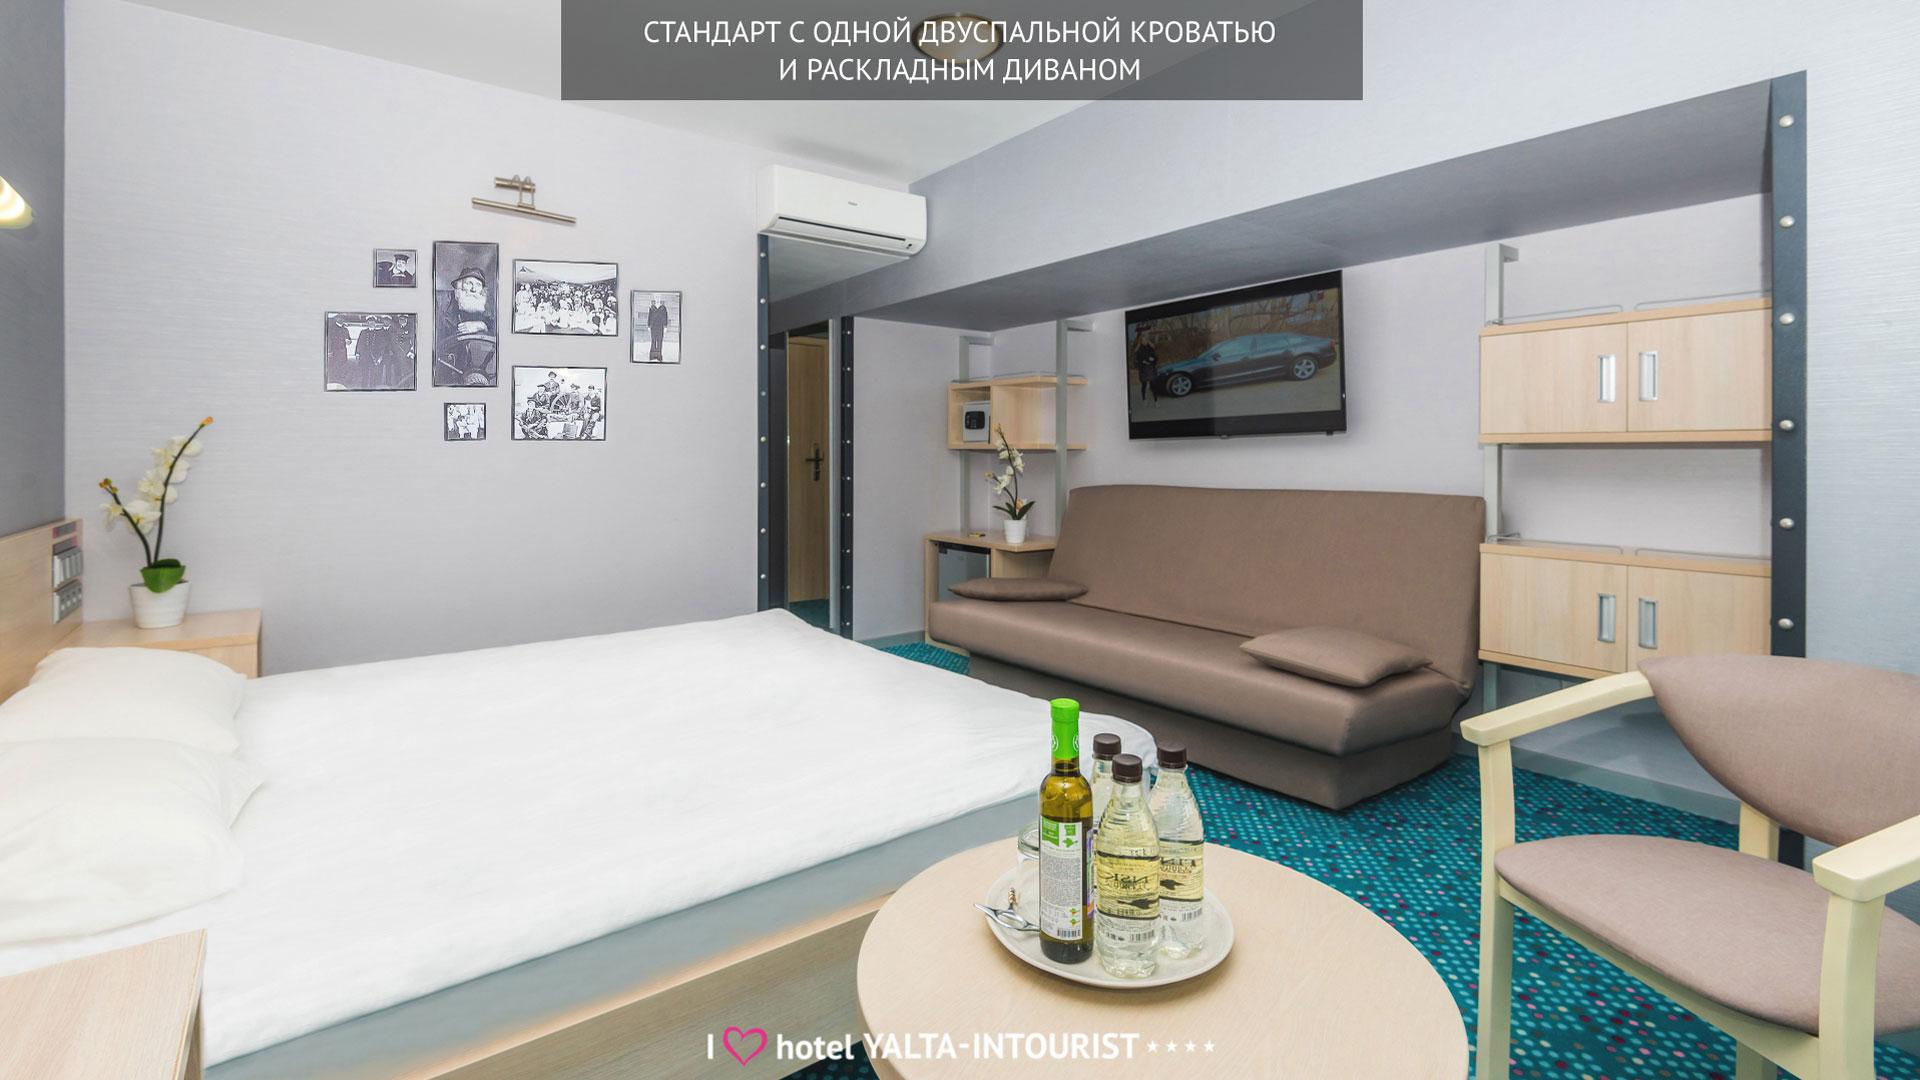 Гостиница в Ялте